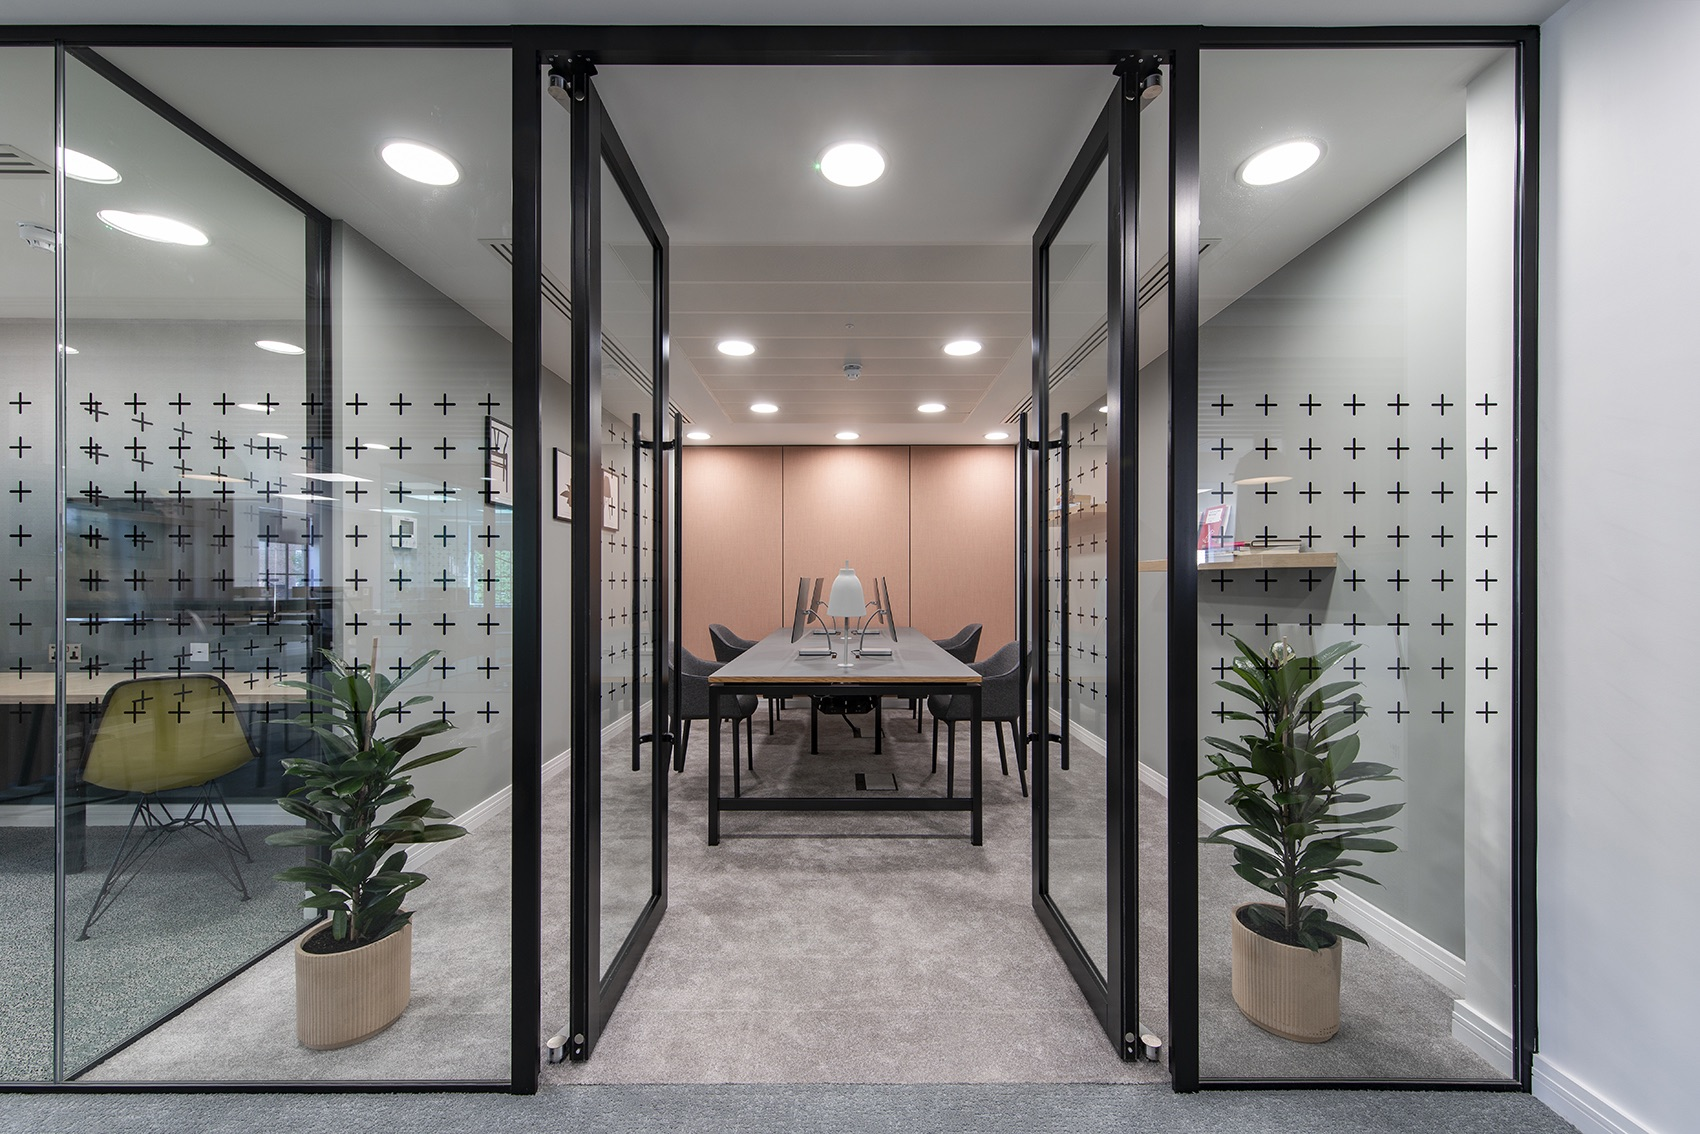 peldon-rose-new-office-london-7